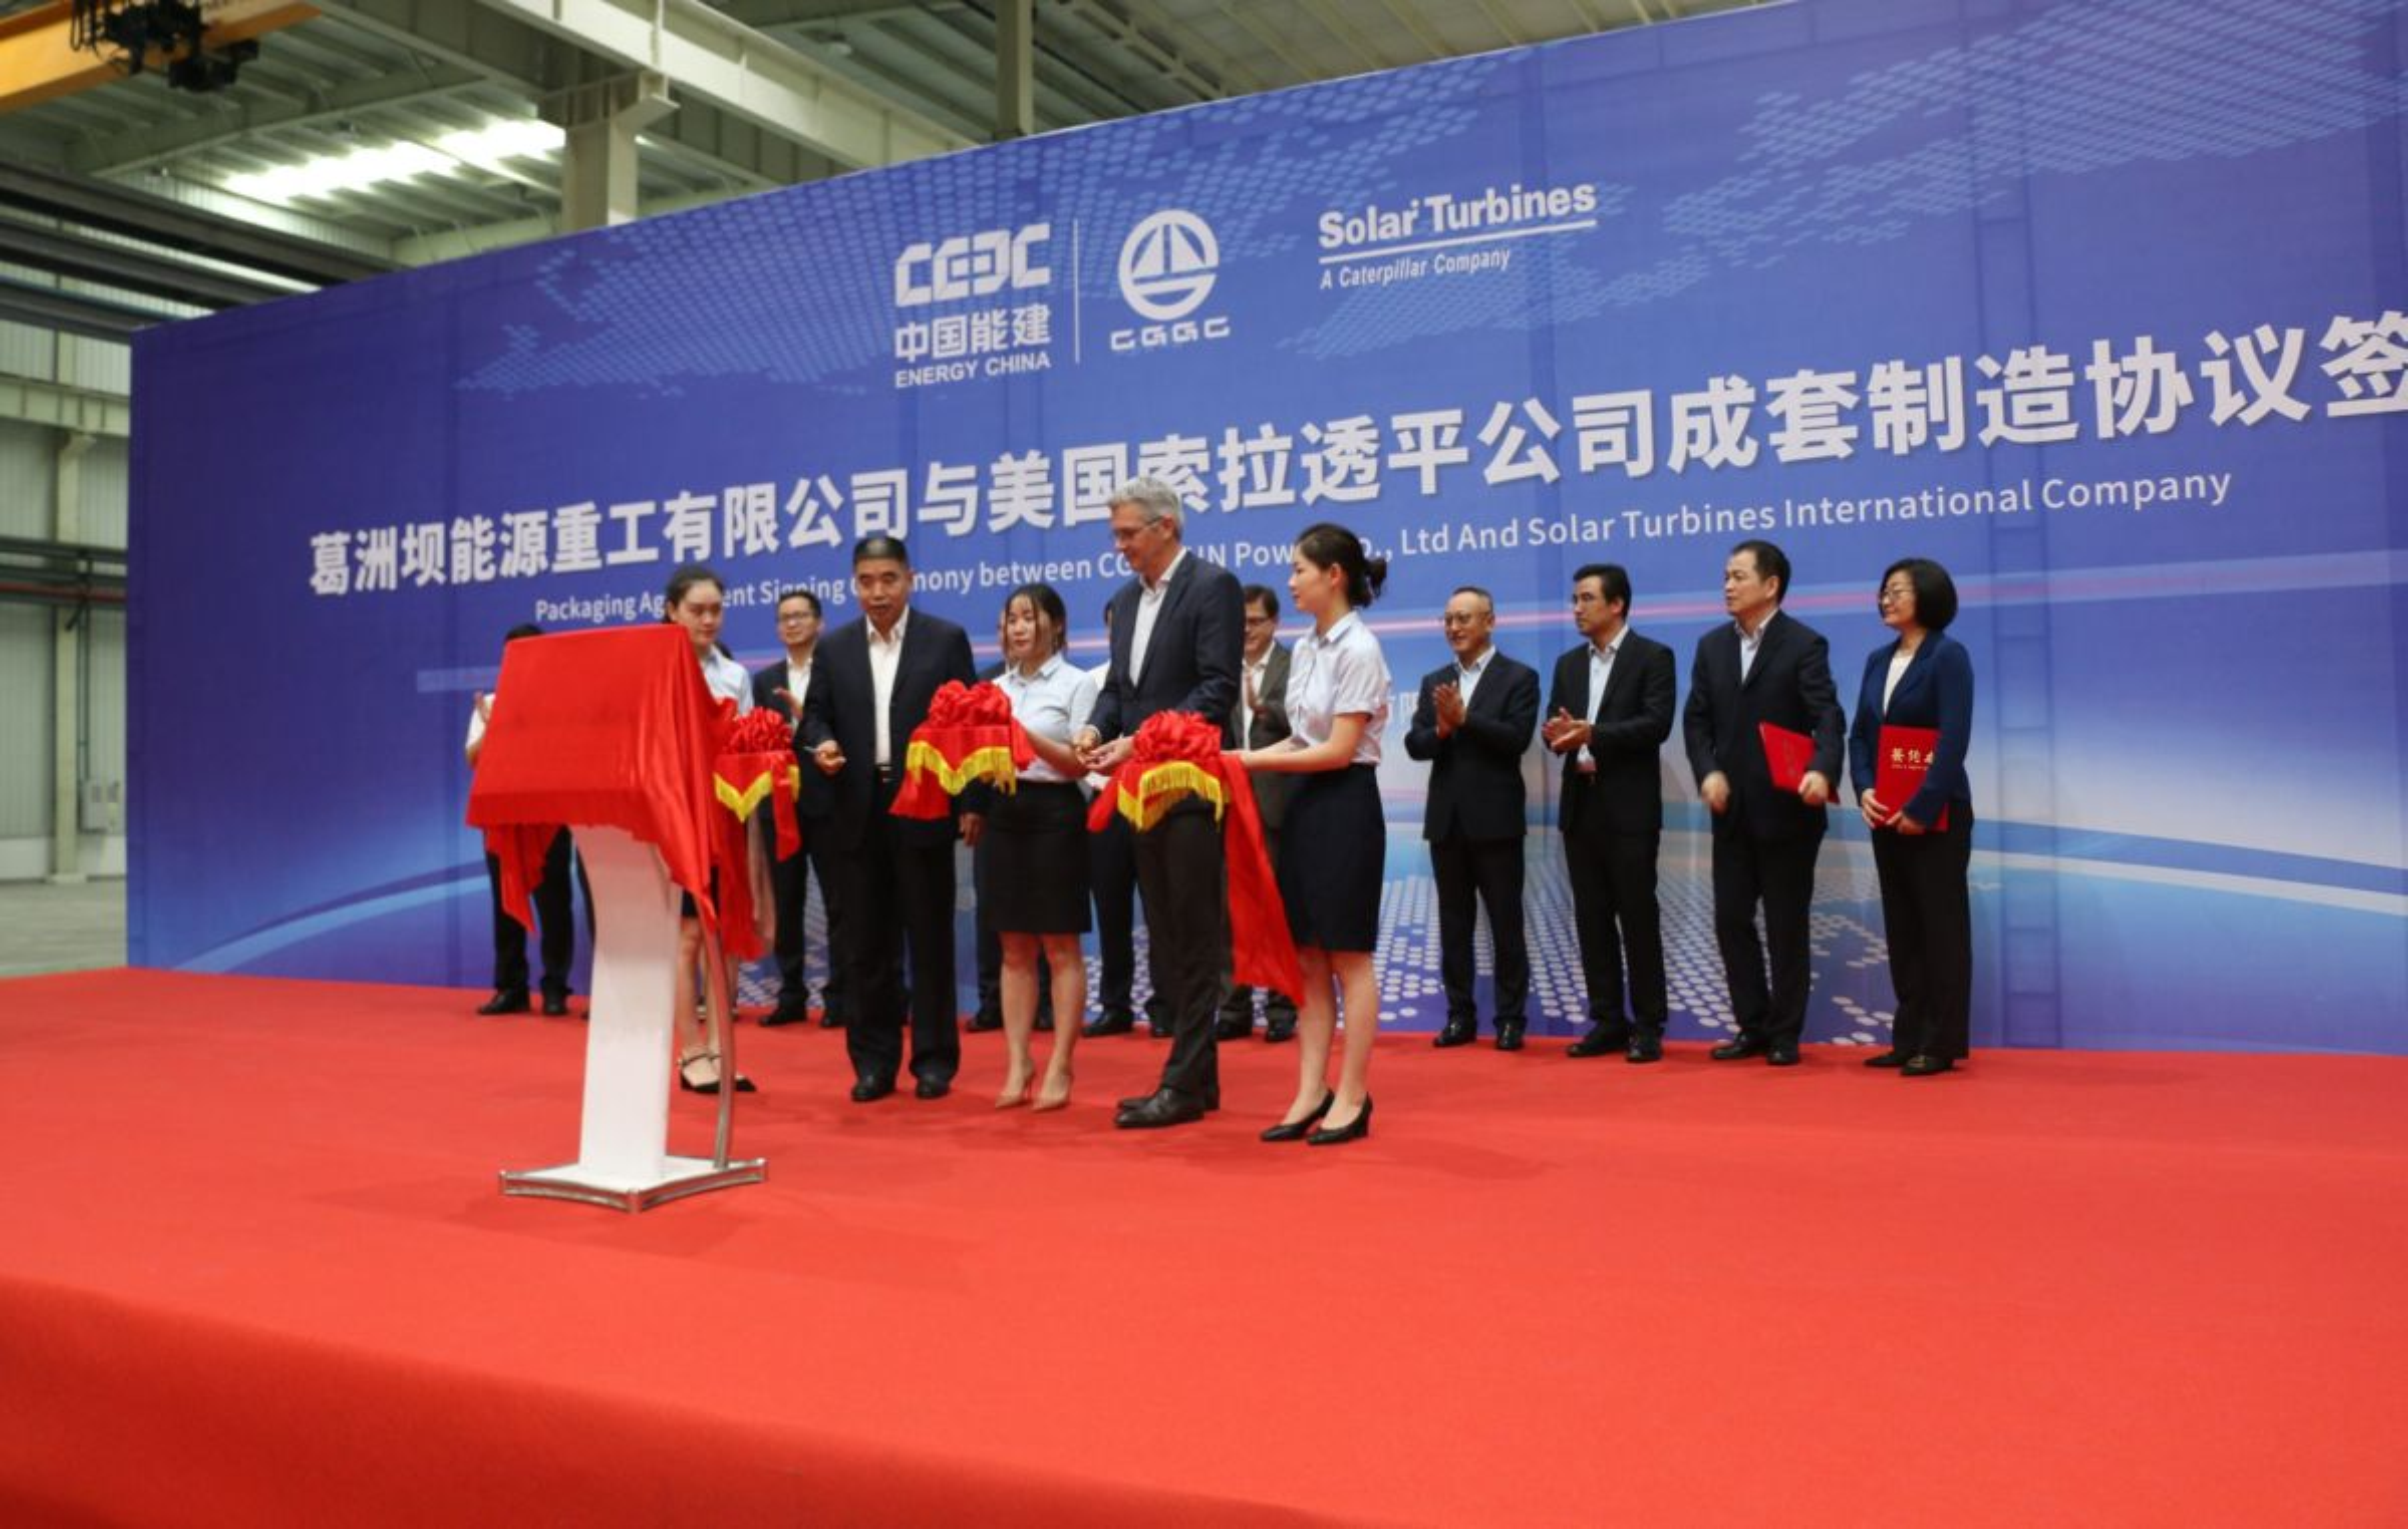 CGGC UN-Power and Solar Turbines Packaging Associate Agreement